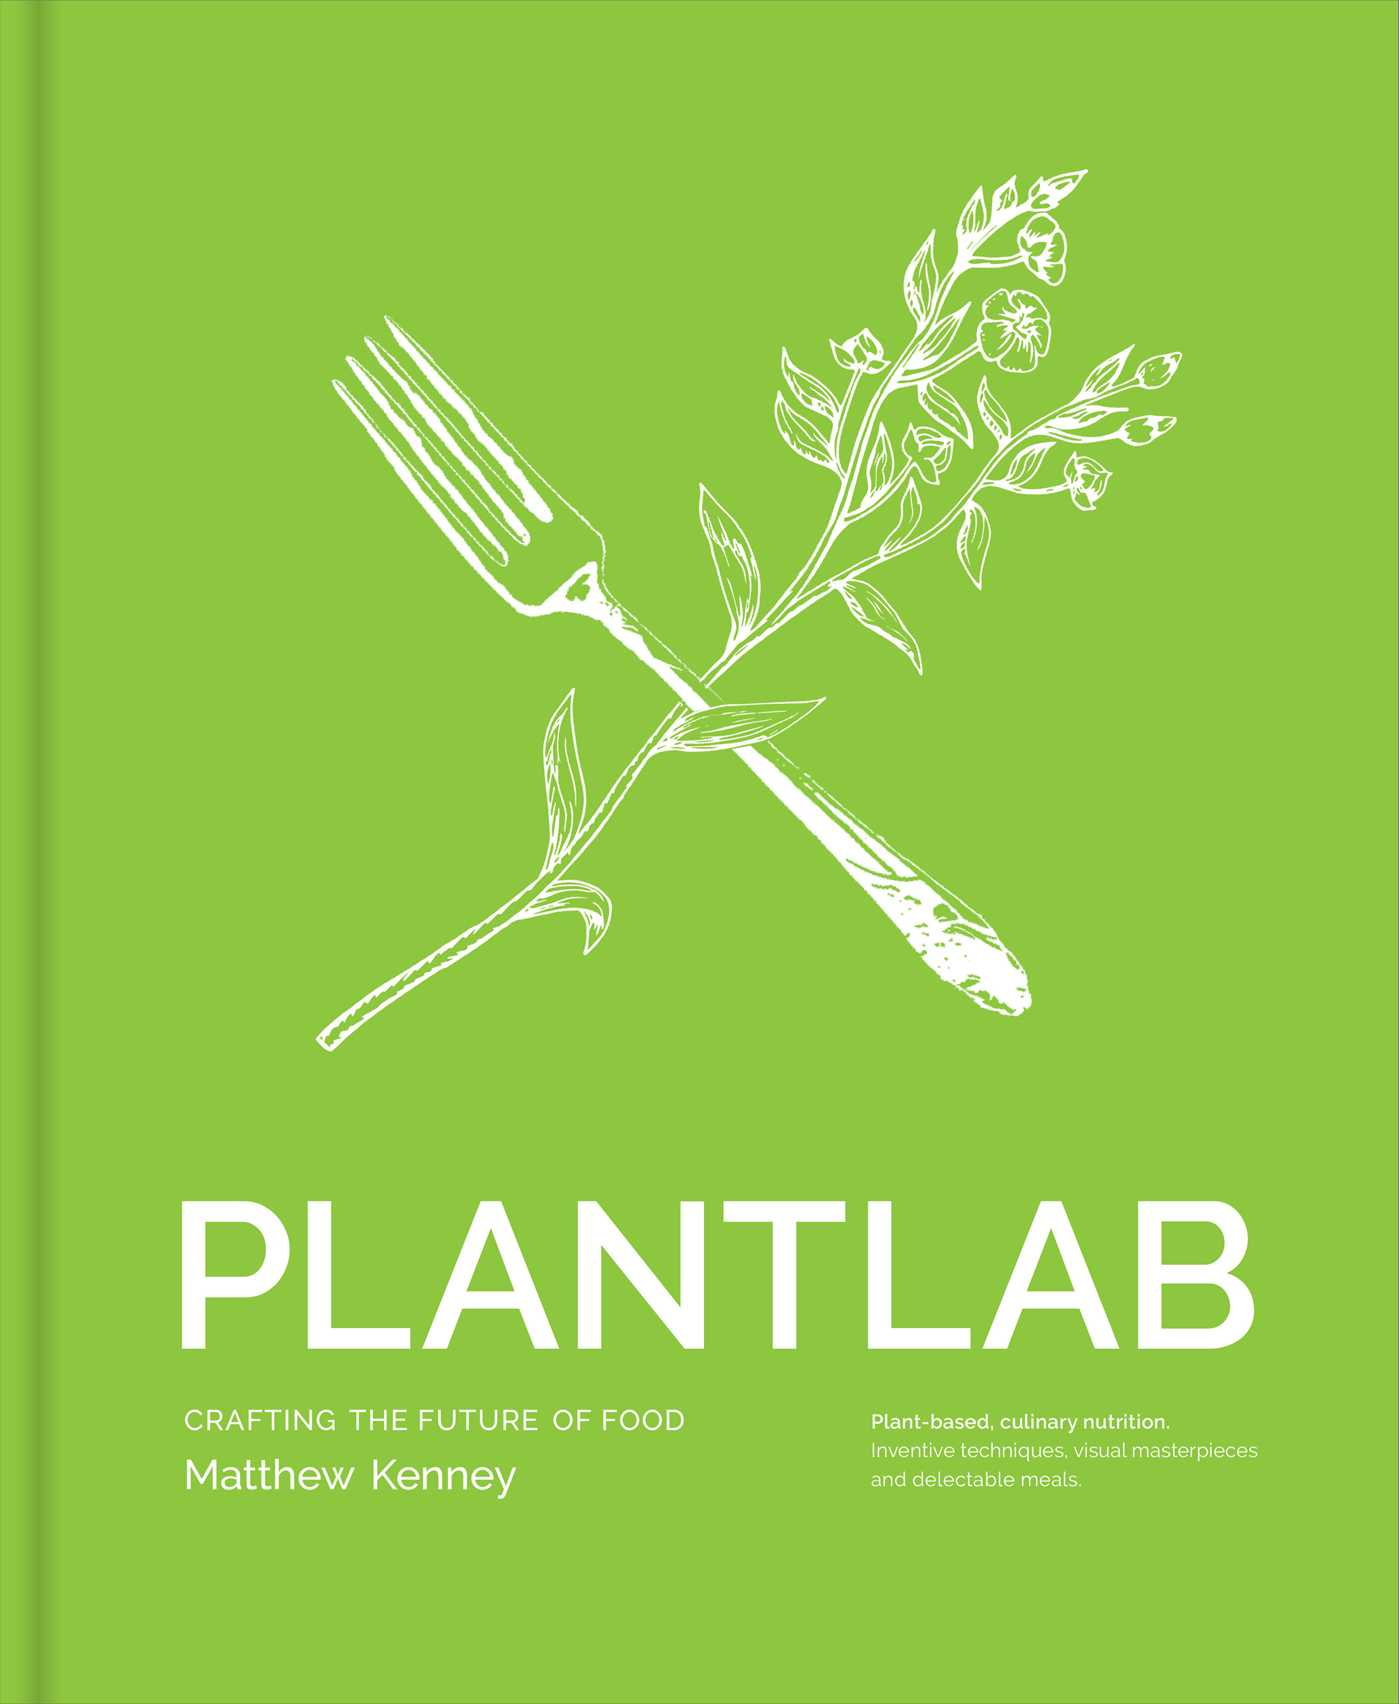 Plantlab 9781682450888 hr